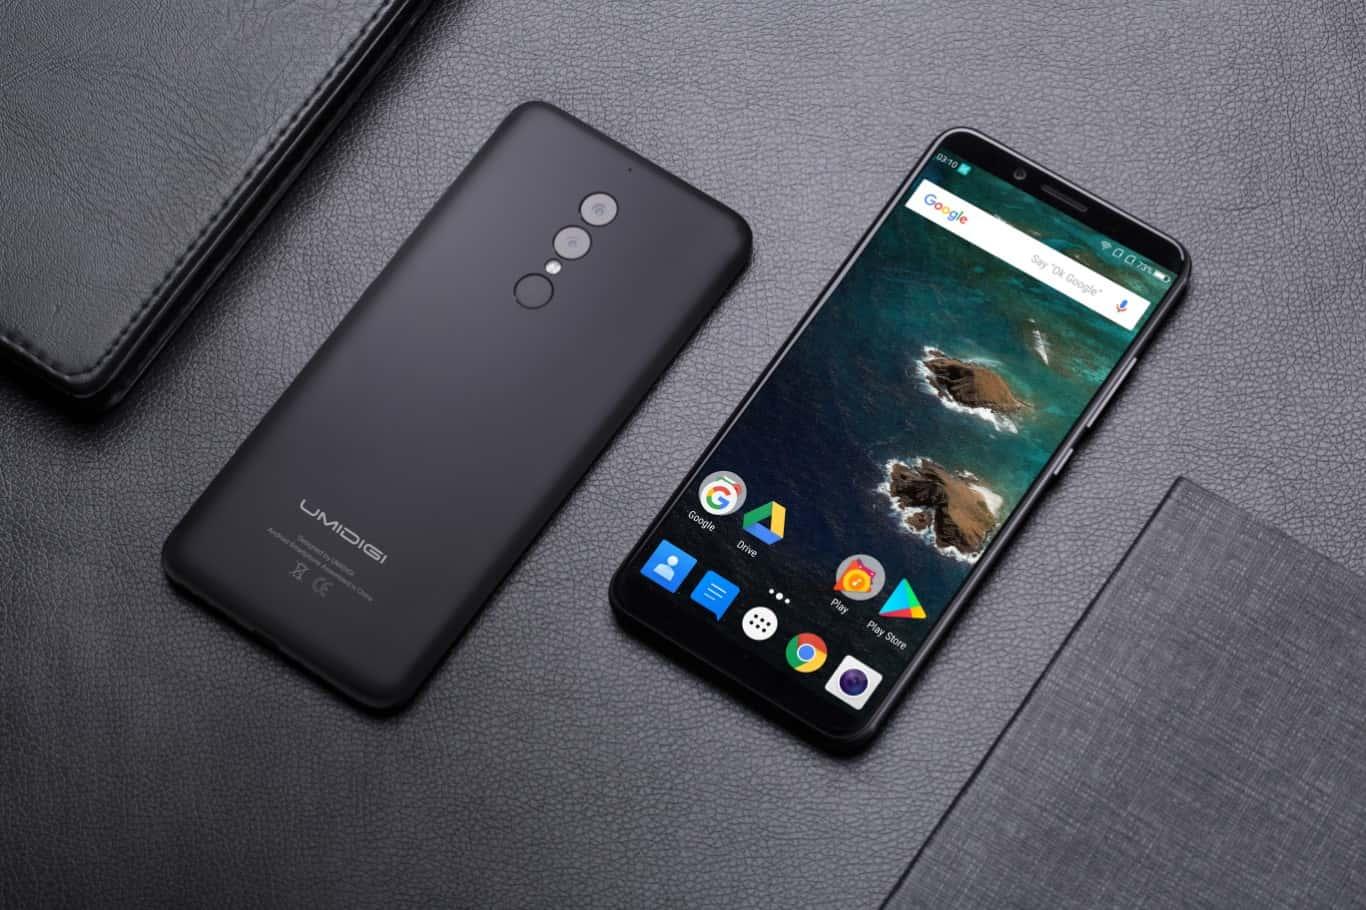 Umidigi S2 Lite S Specs Revealed Phone Will Cost 149 99